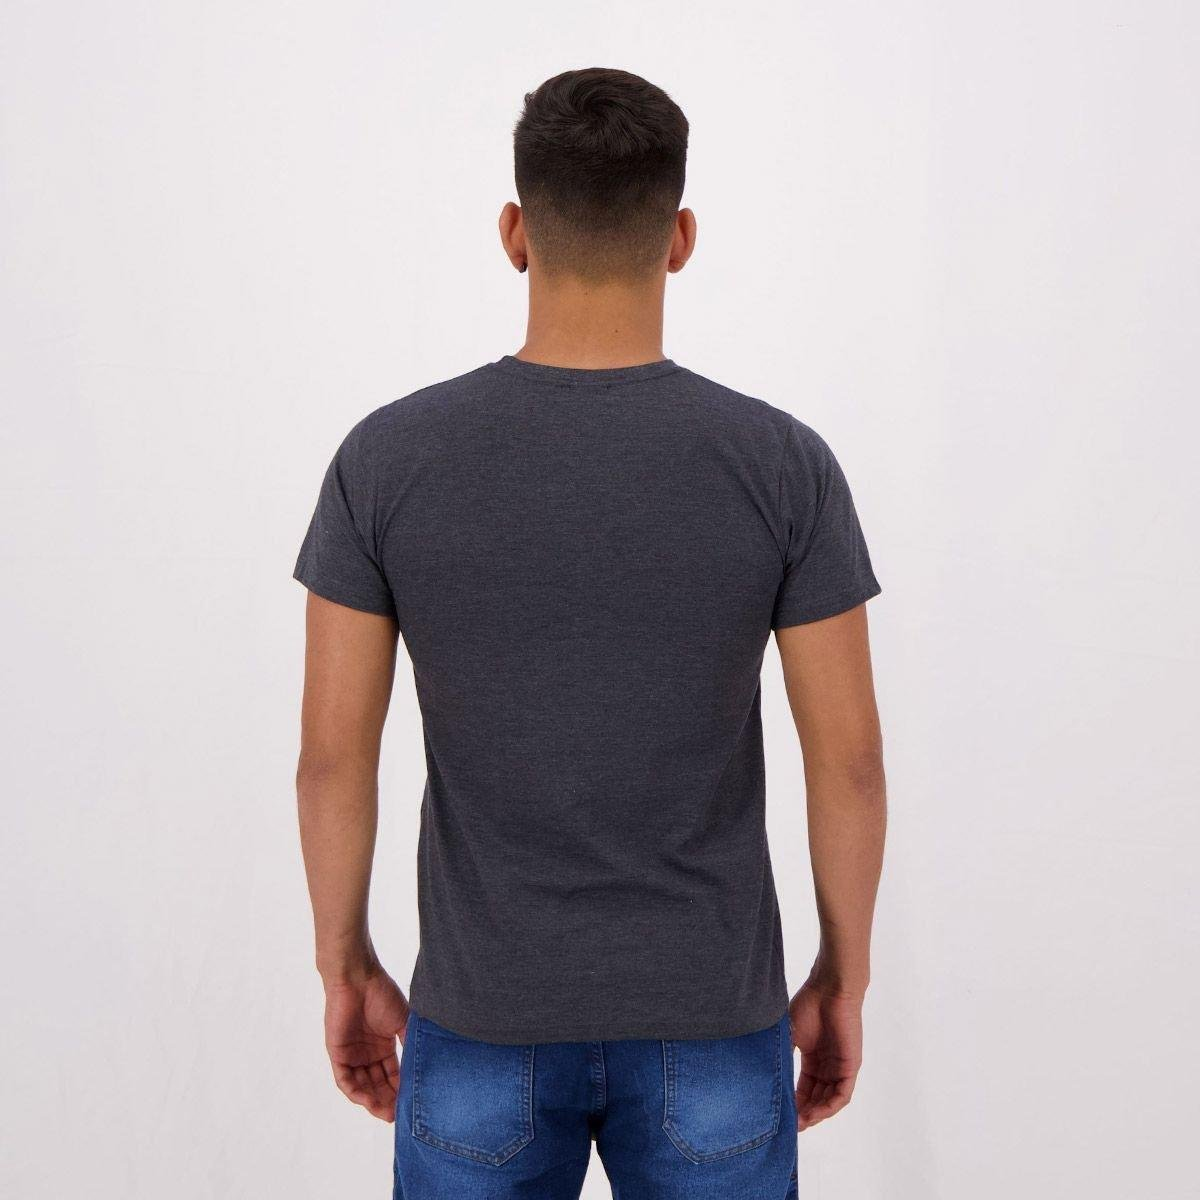 Camiseta Kappa Founded Year Masculina - Cinza